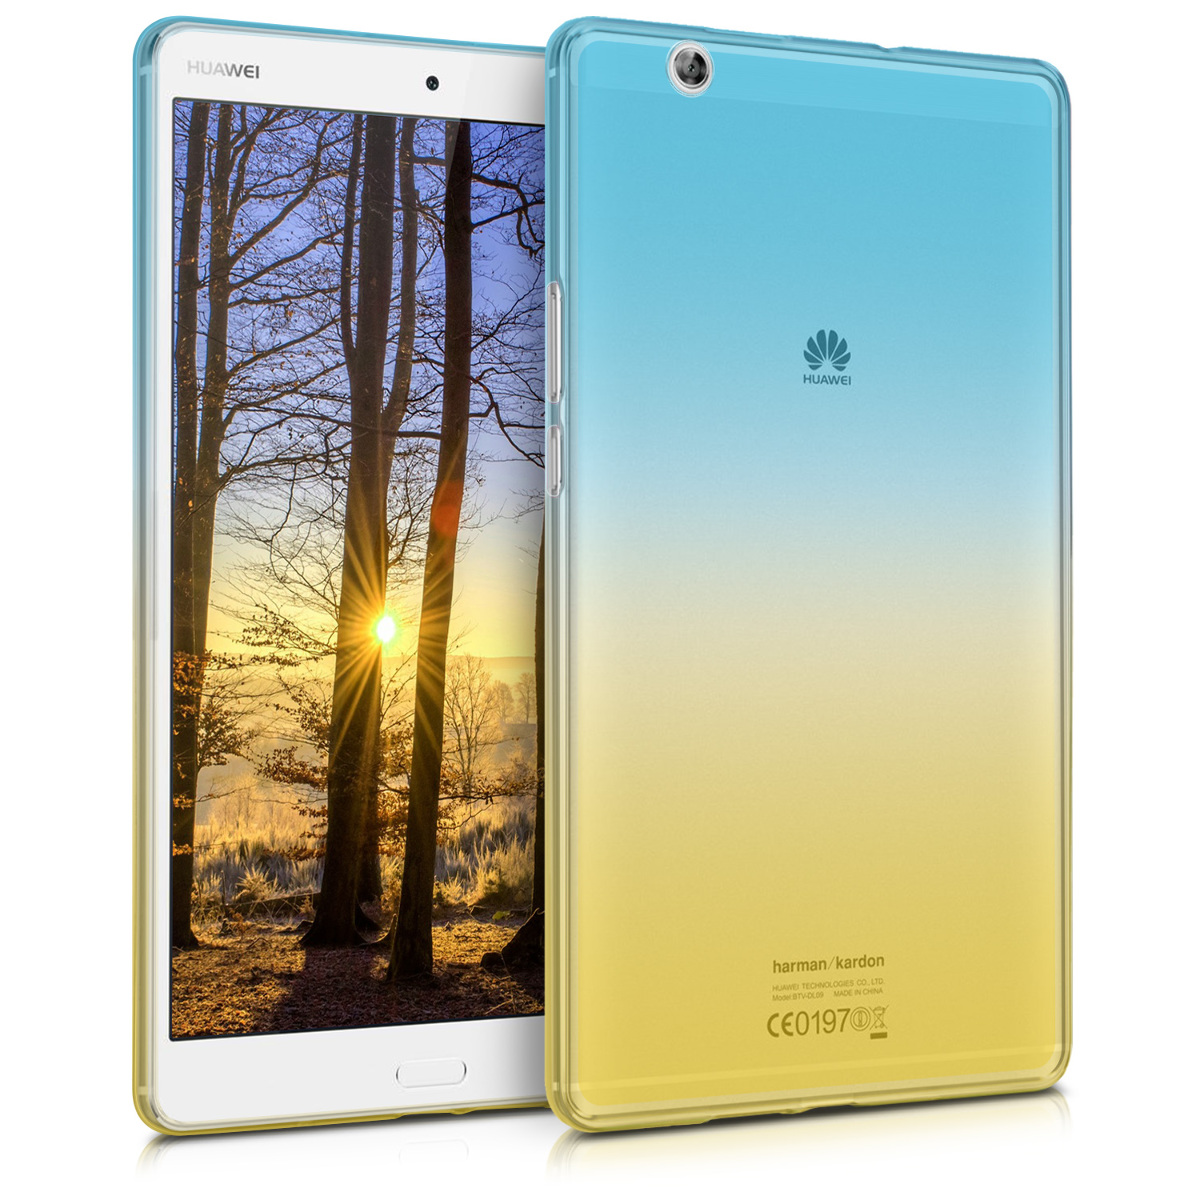 KW Ημιδιάφανη Θήκη Σιλικόνη Huawei MediaPad M3 8.4 - Soft Flexible Shock Absorbent Protective Cover - Blue / Yellow / Transparent (39963.04)